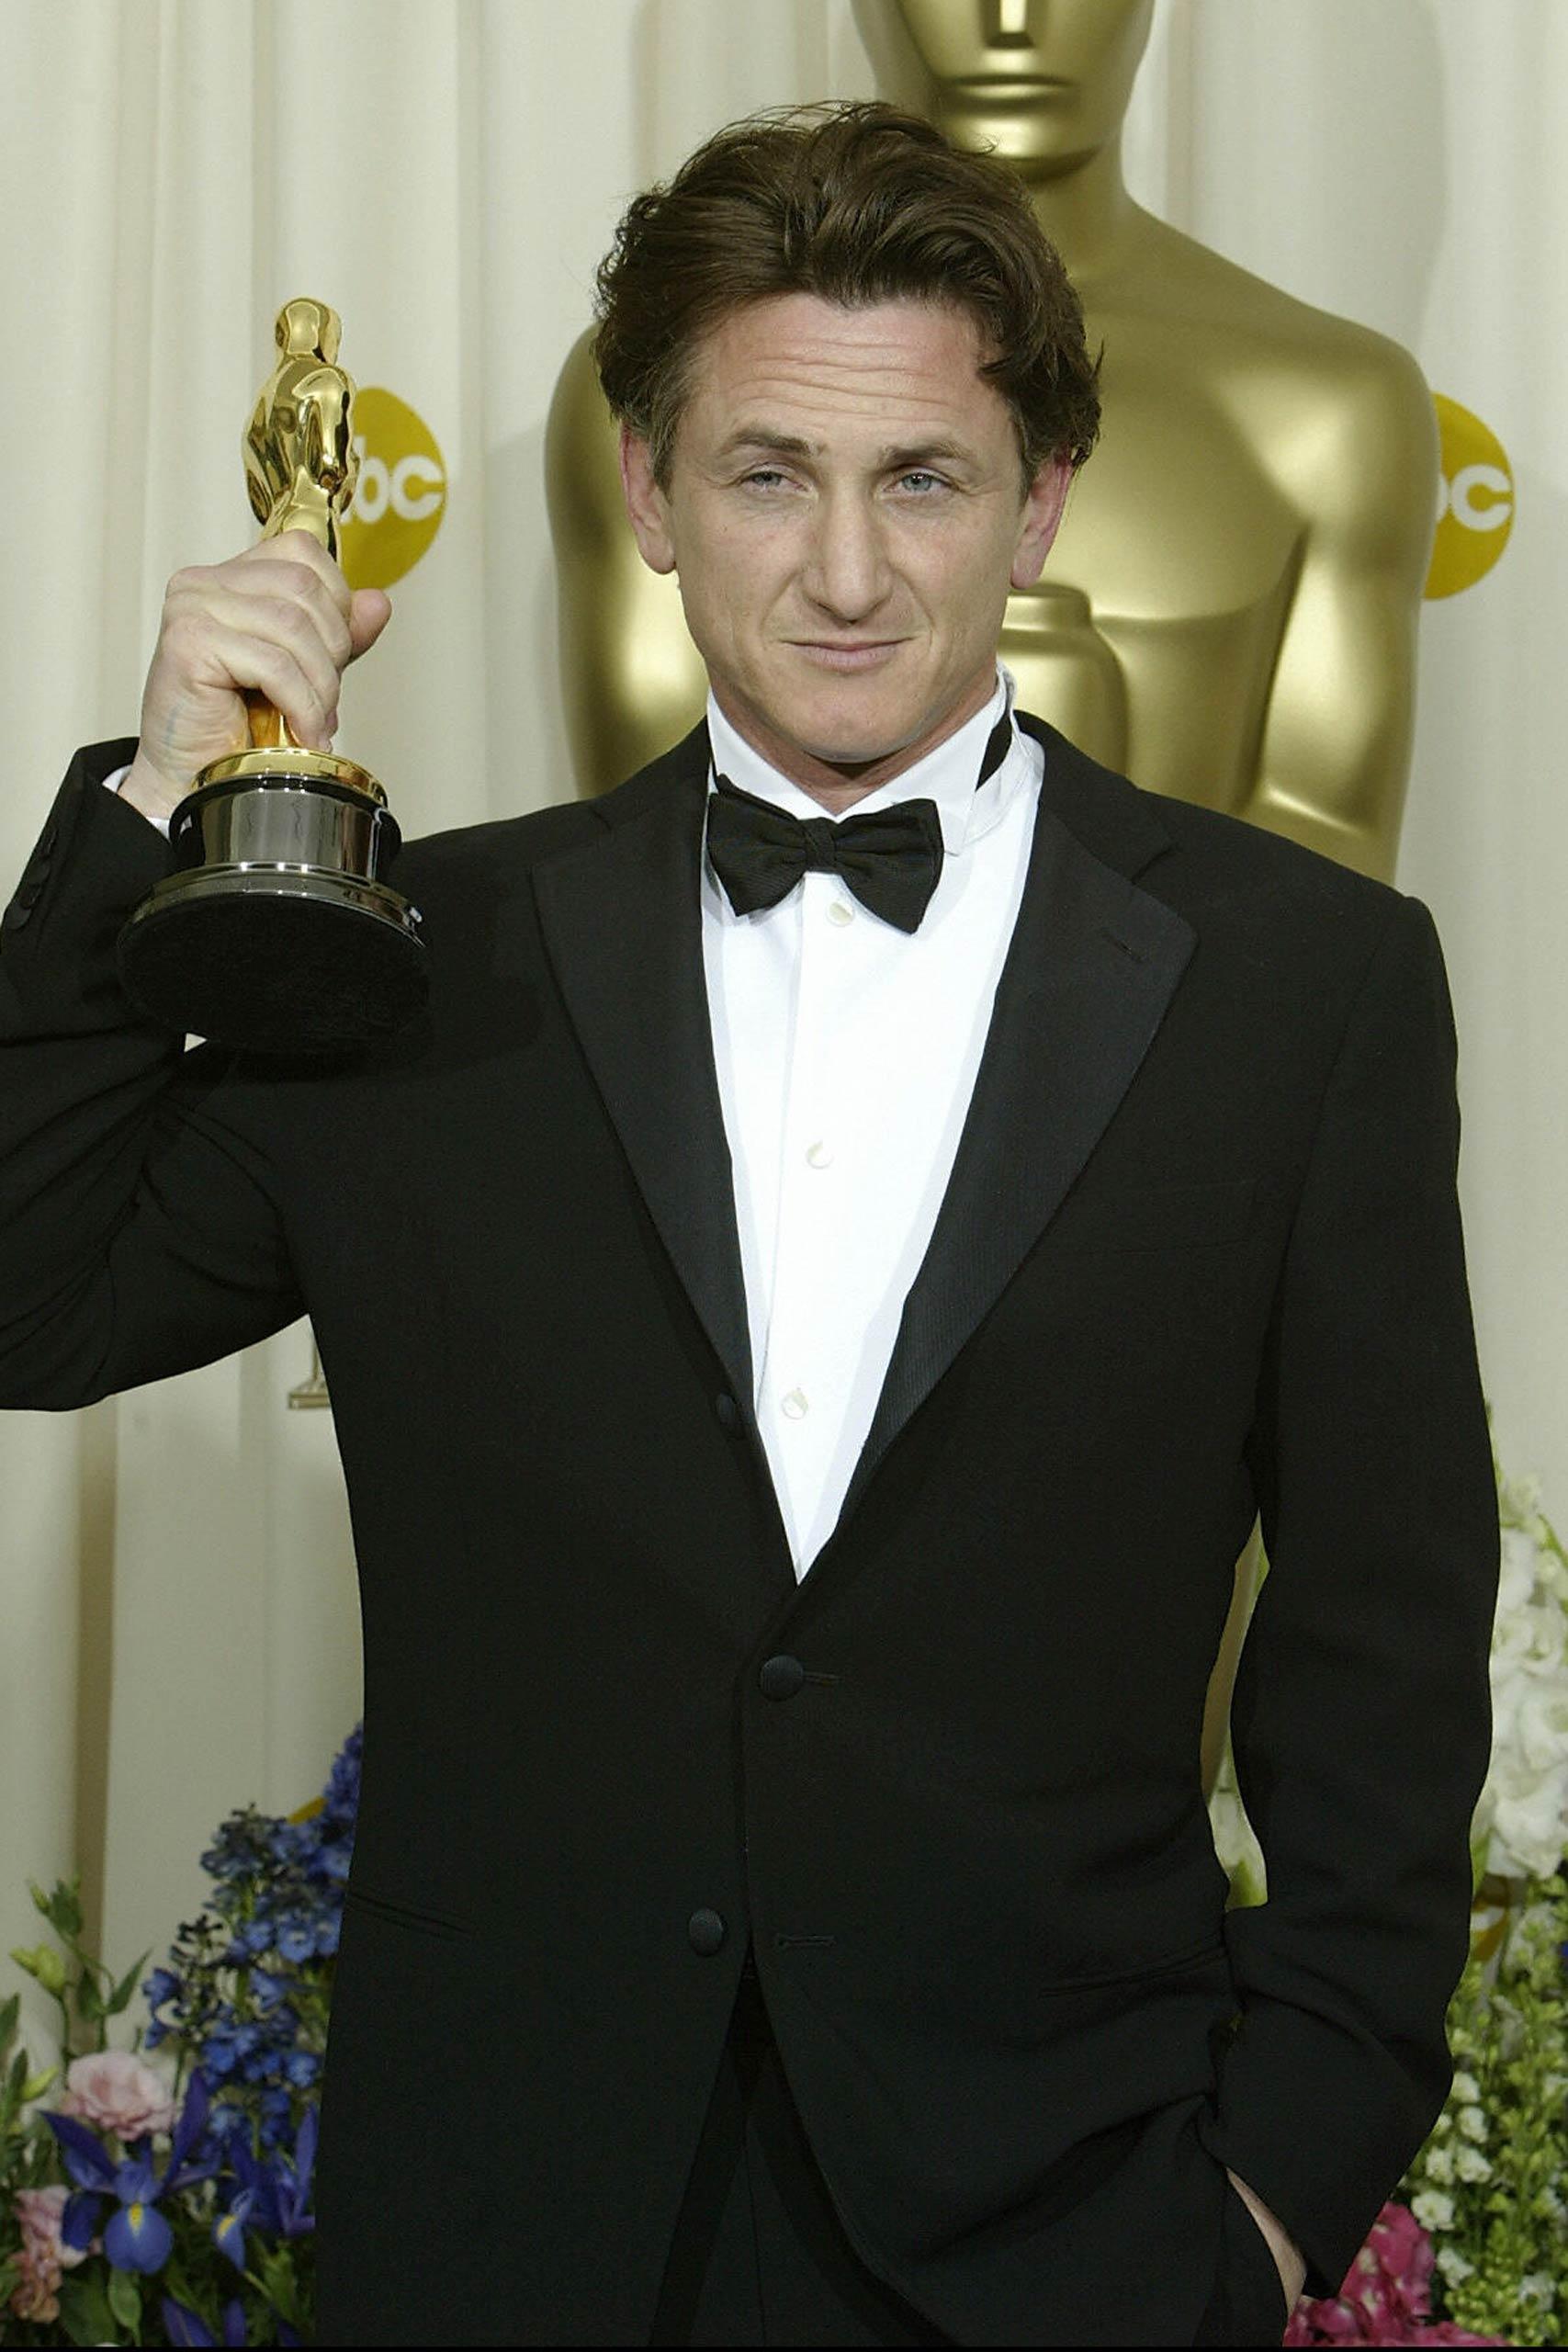 <strong>2004: Sean Penn - <i>Mystic River</i>                                   2009: Sean Penn - <i>Milk</i></strong>